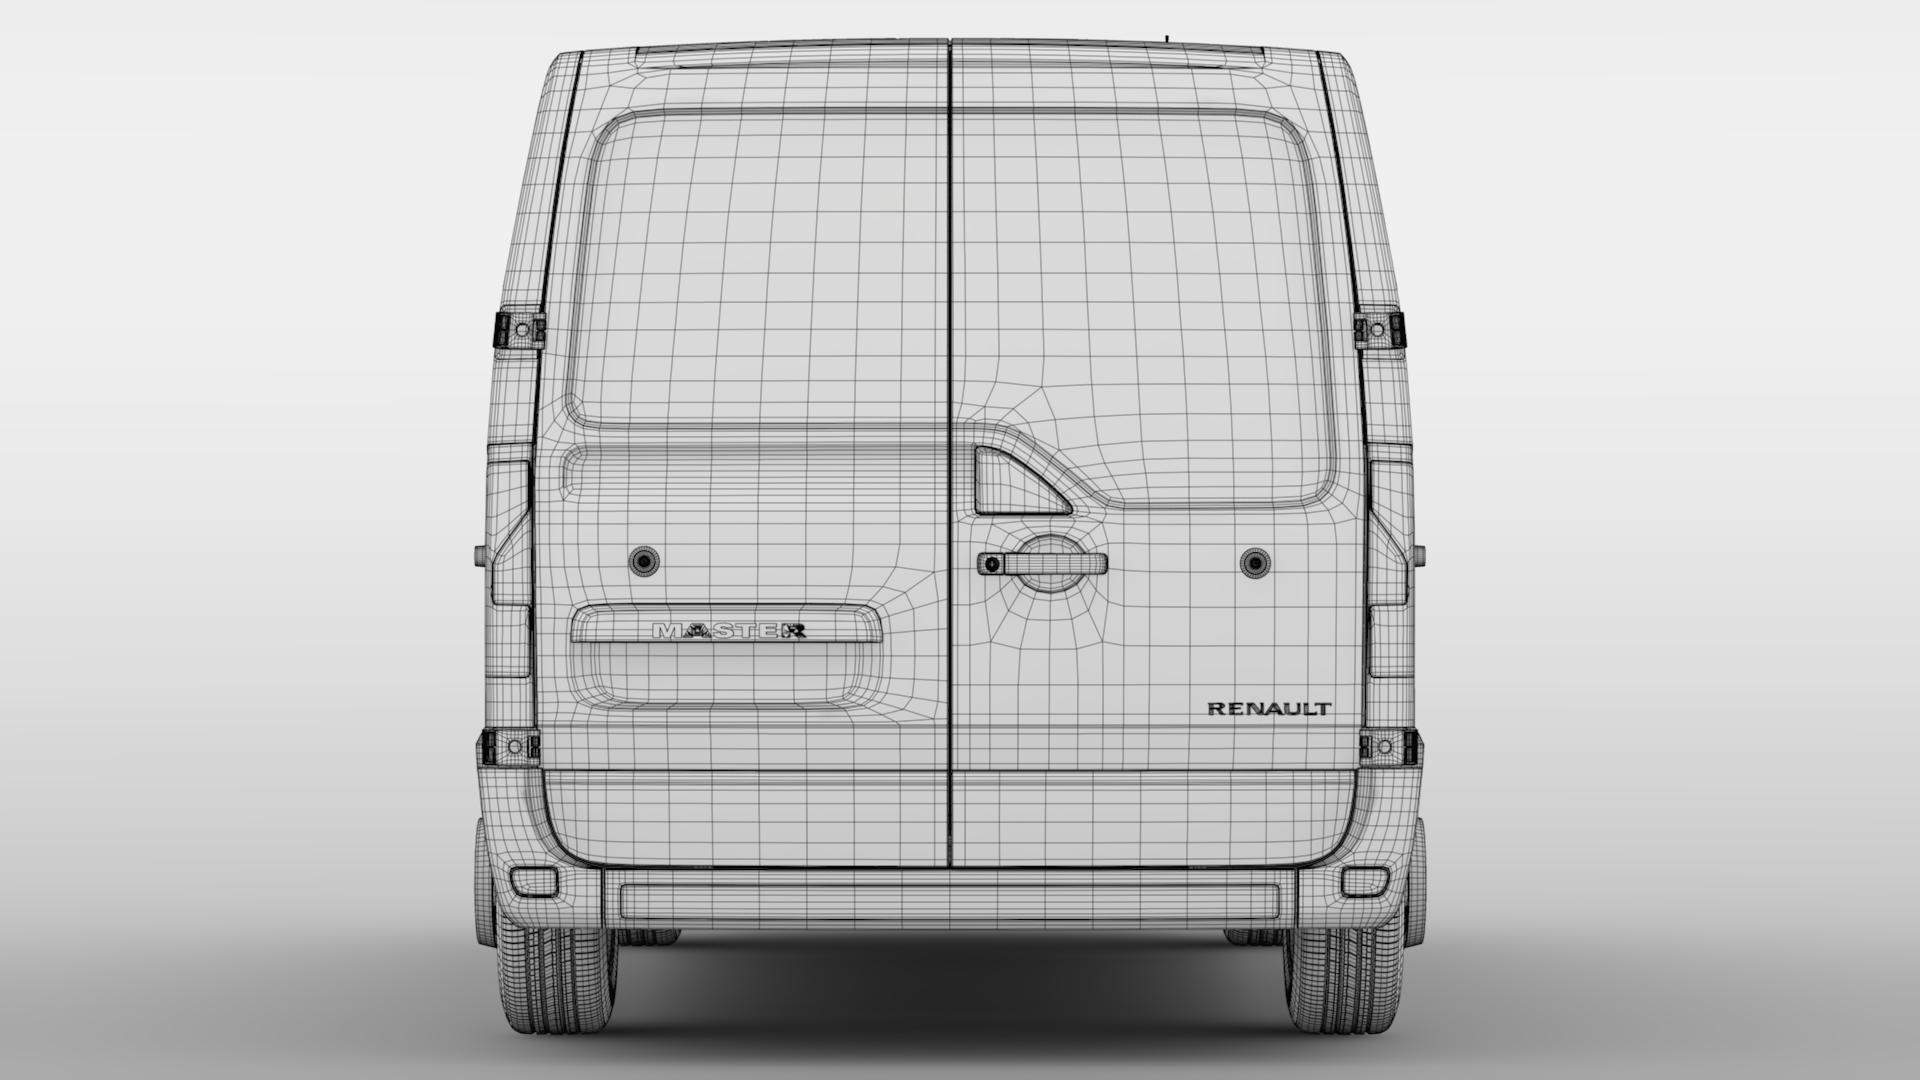 renault meistars l1h1 van 2017 3d modelis 3ds maks.